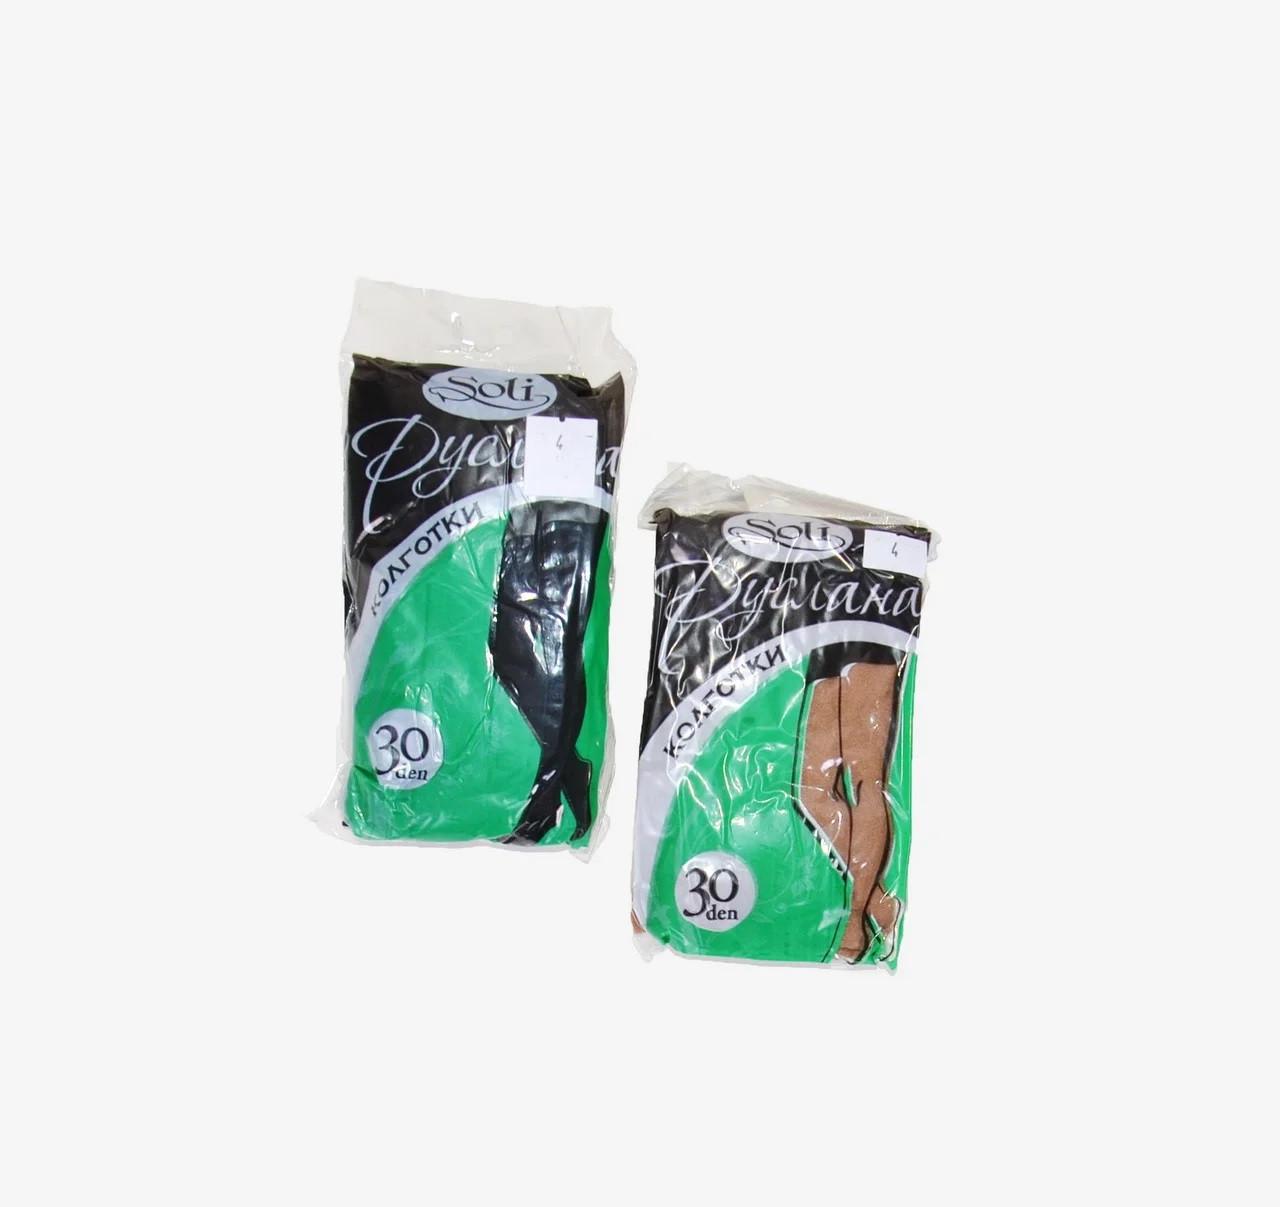 Колготки капроновые 30 ден, размер 50-52, бежевые. От 6 пар по 15 грн.